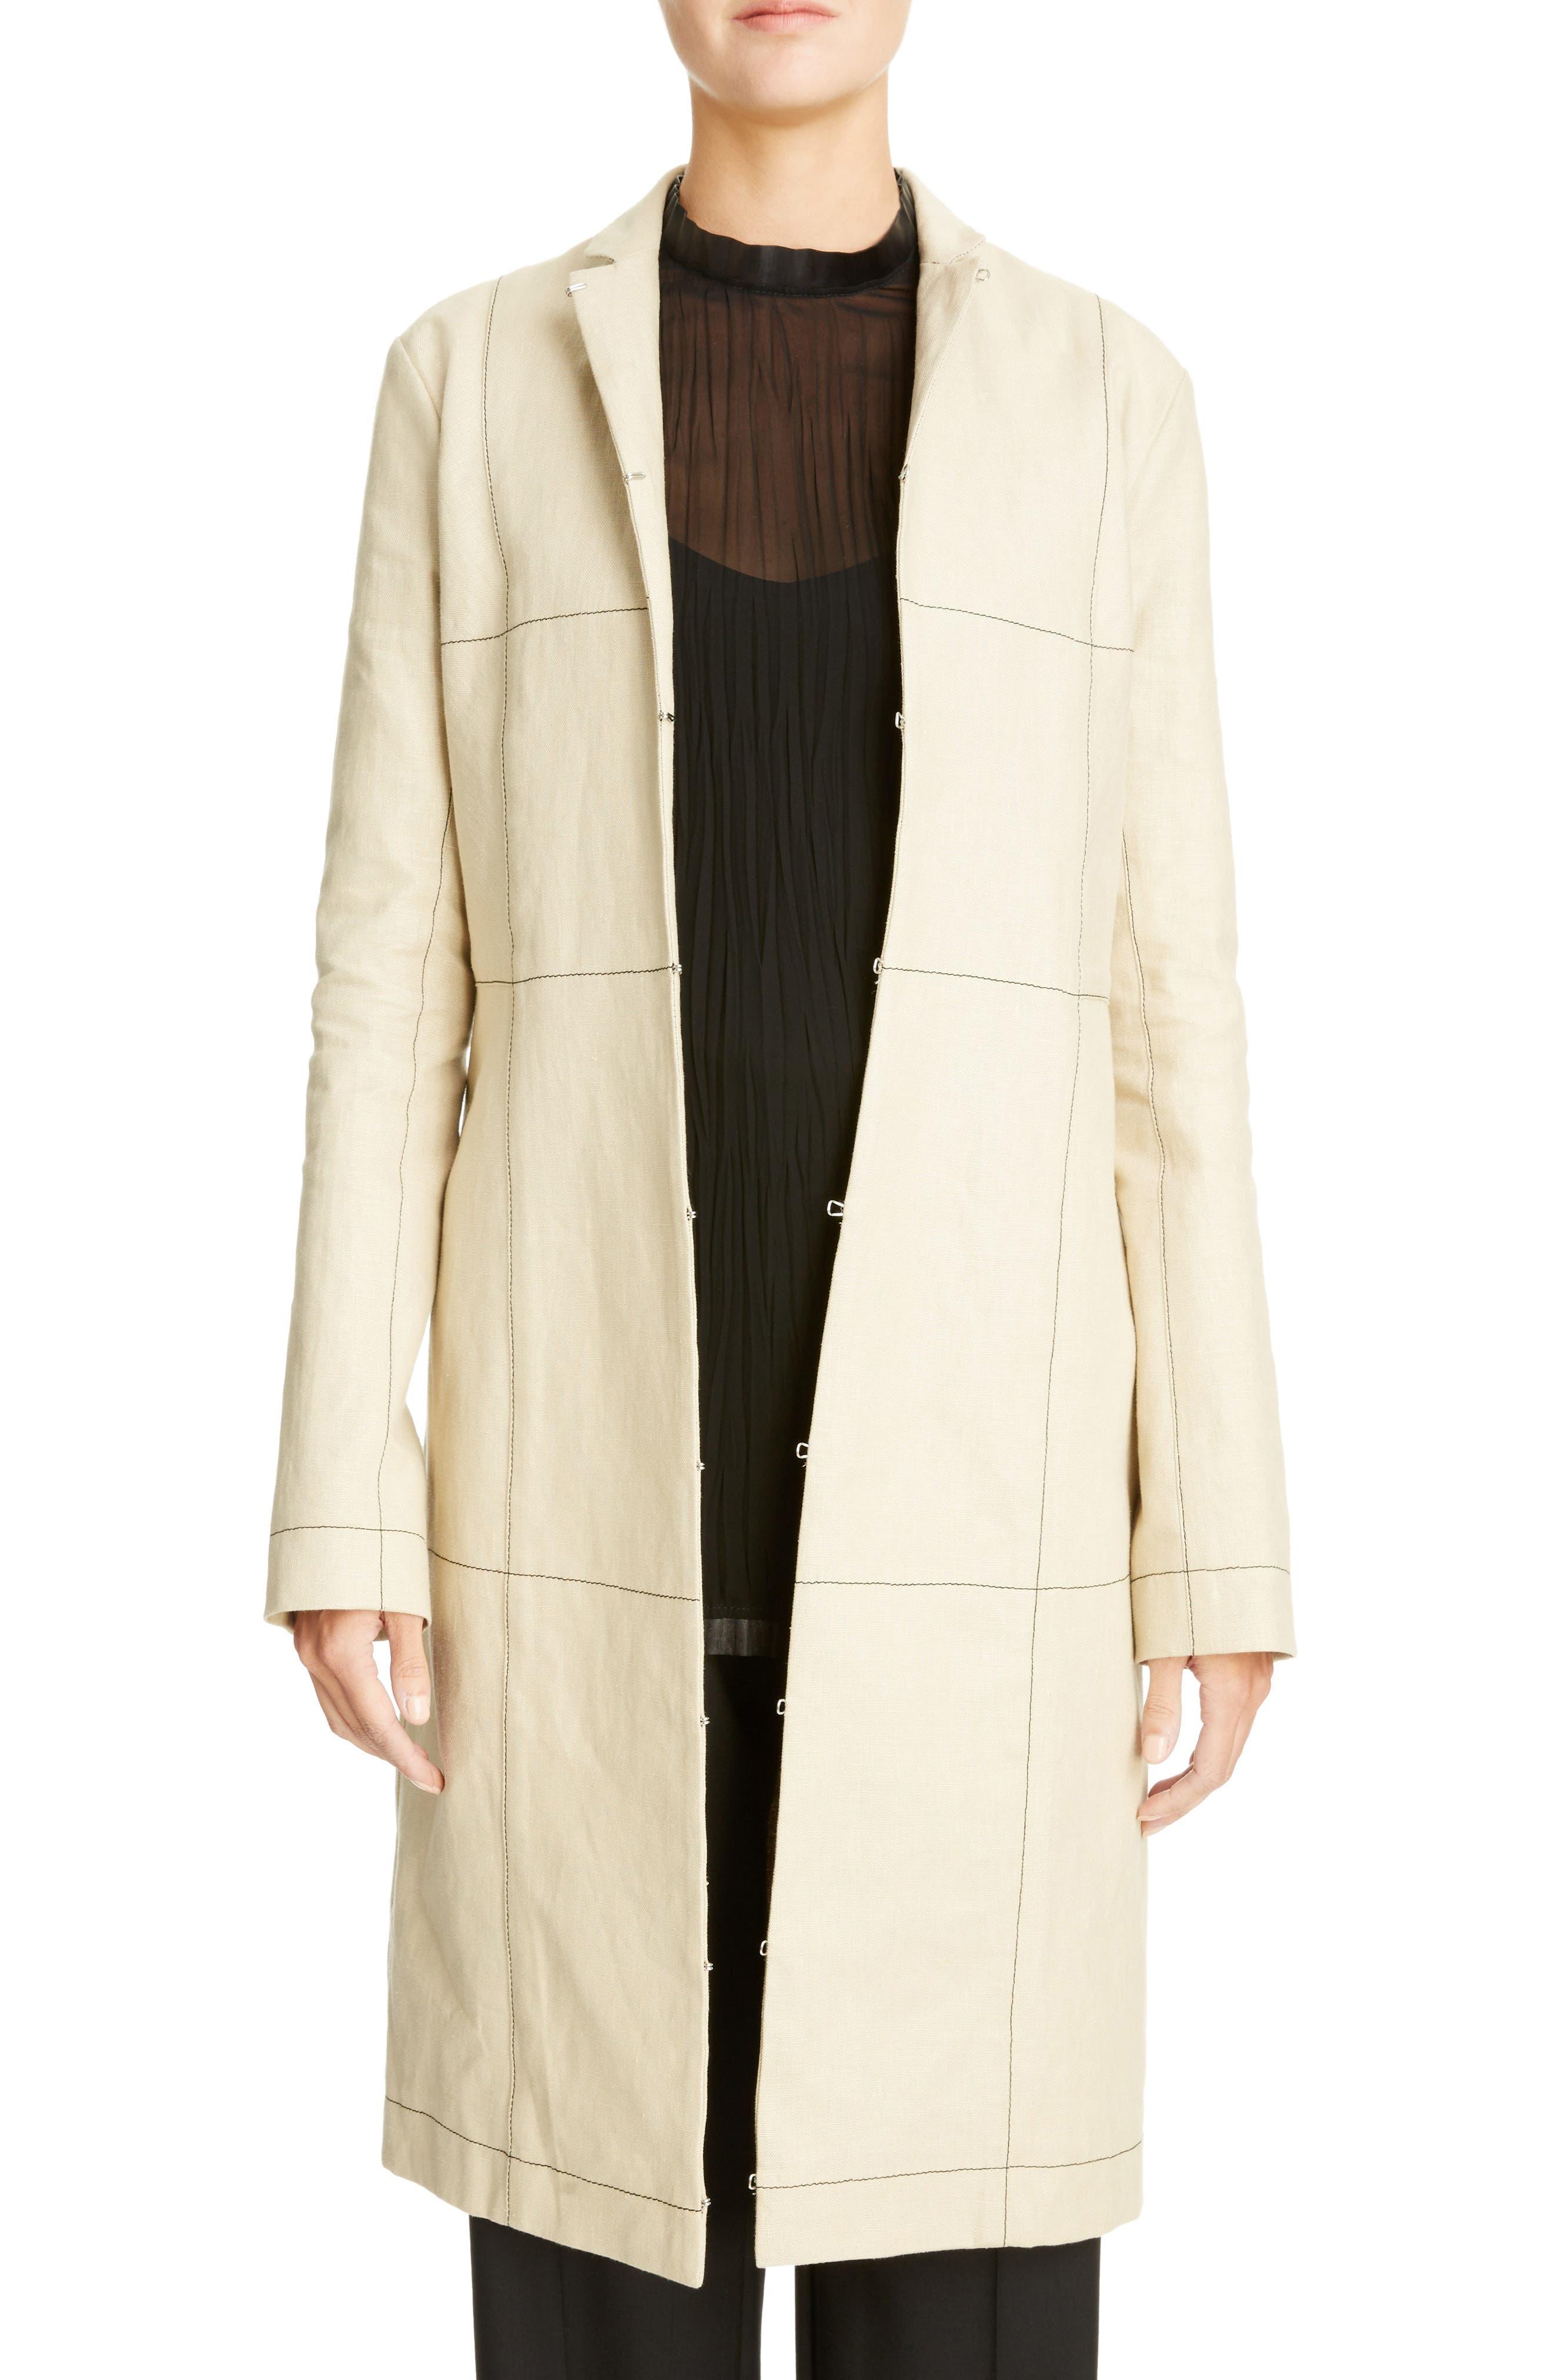 Topstitched Linen Coat,                         Main,                         color, Beige